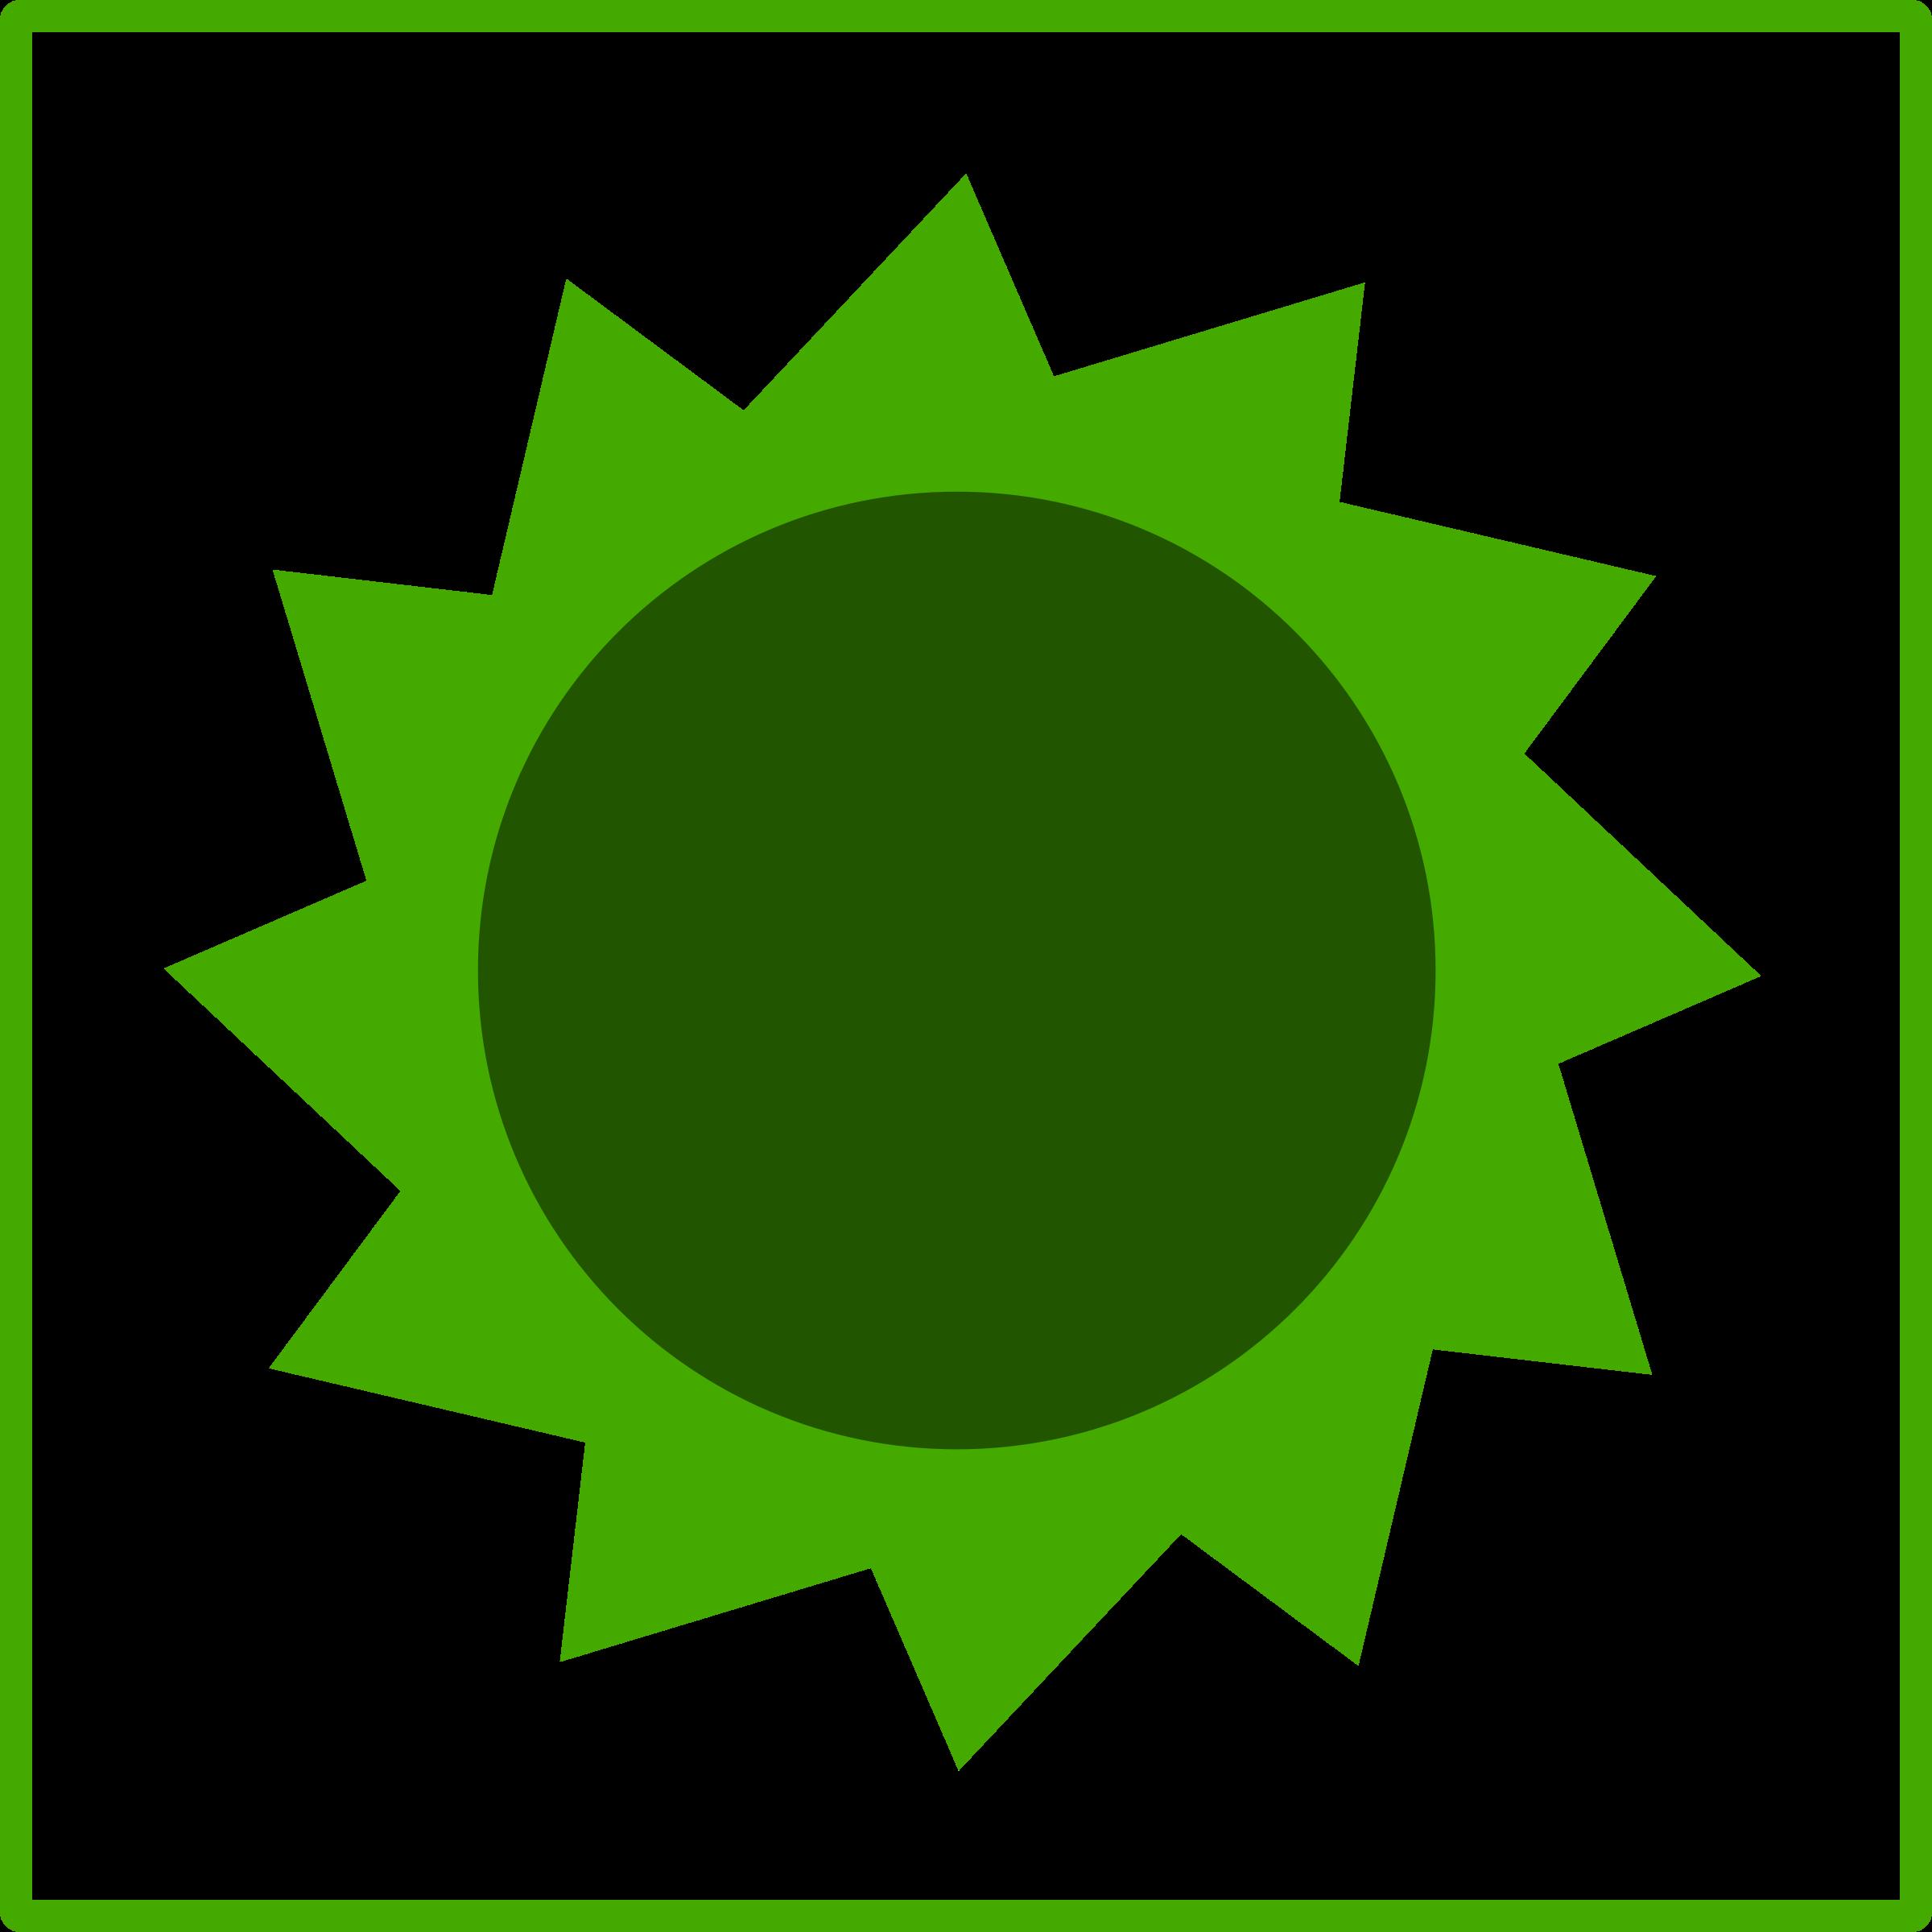 clipart eco green sun icon sun clip art images board sun clip art images black and white